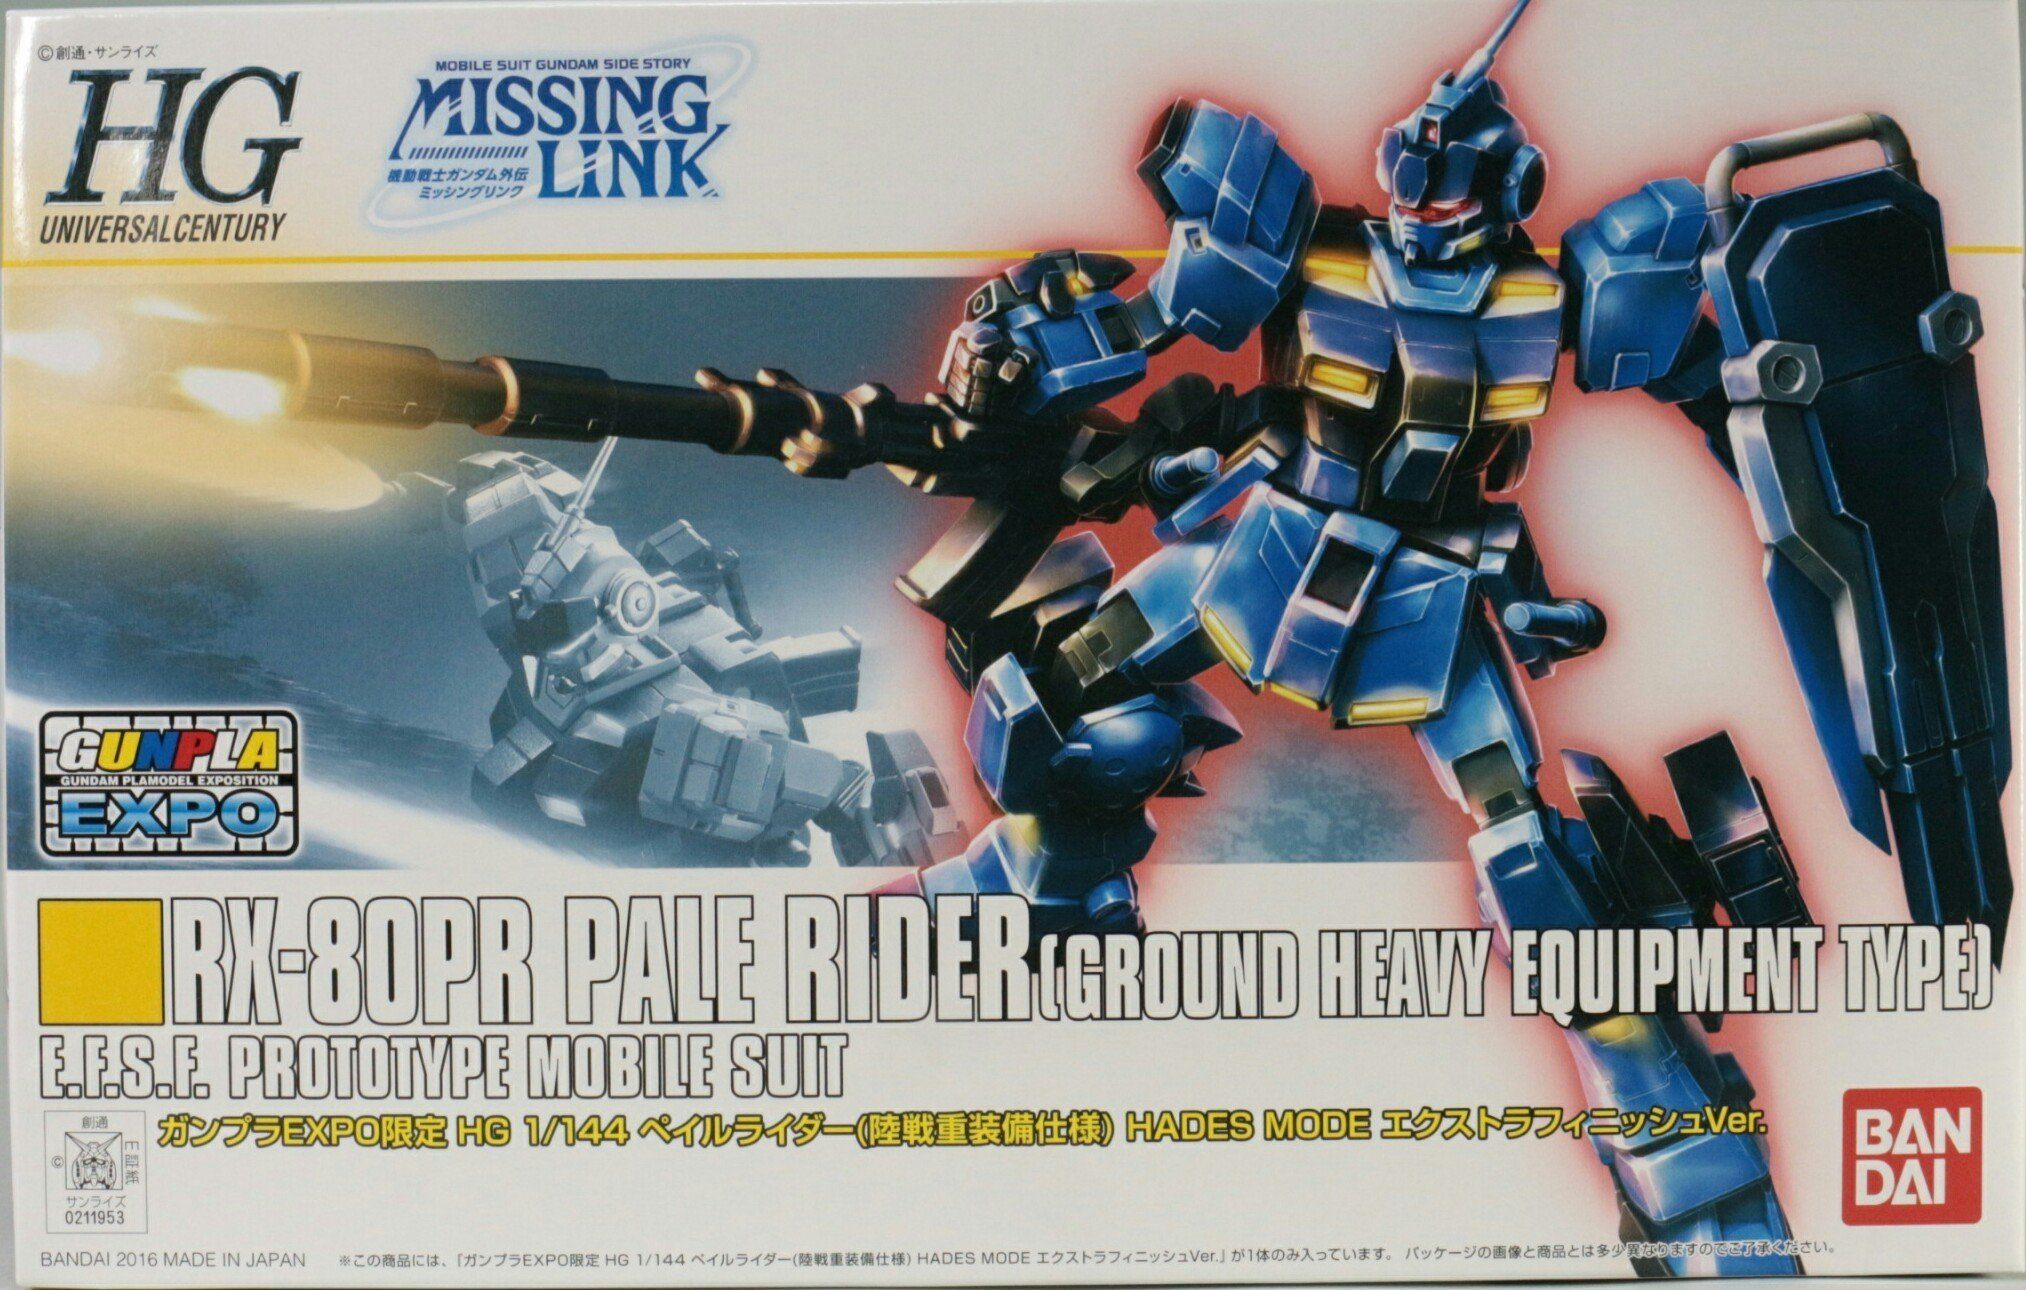 [EXPO] HGUC 1/144 Pale Rider (Ground Heavy Equipment Type) Hades Mode Extra Finish Ver.